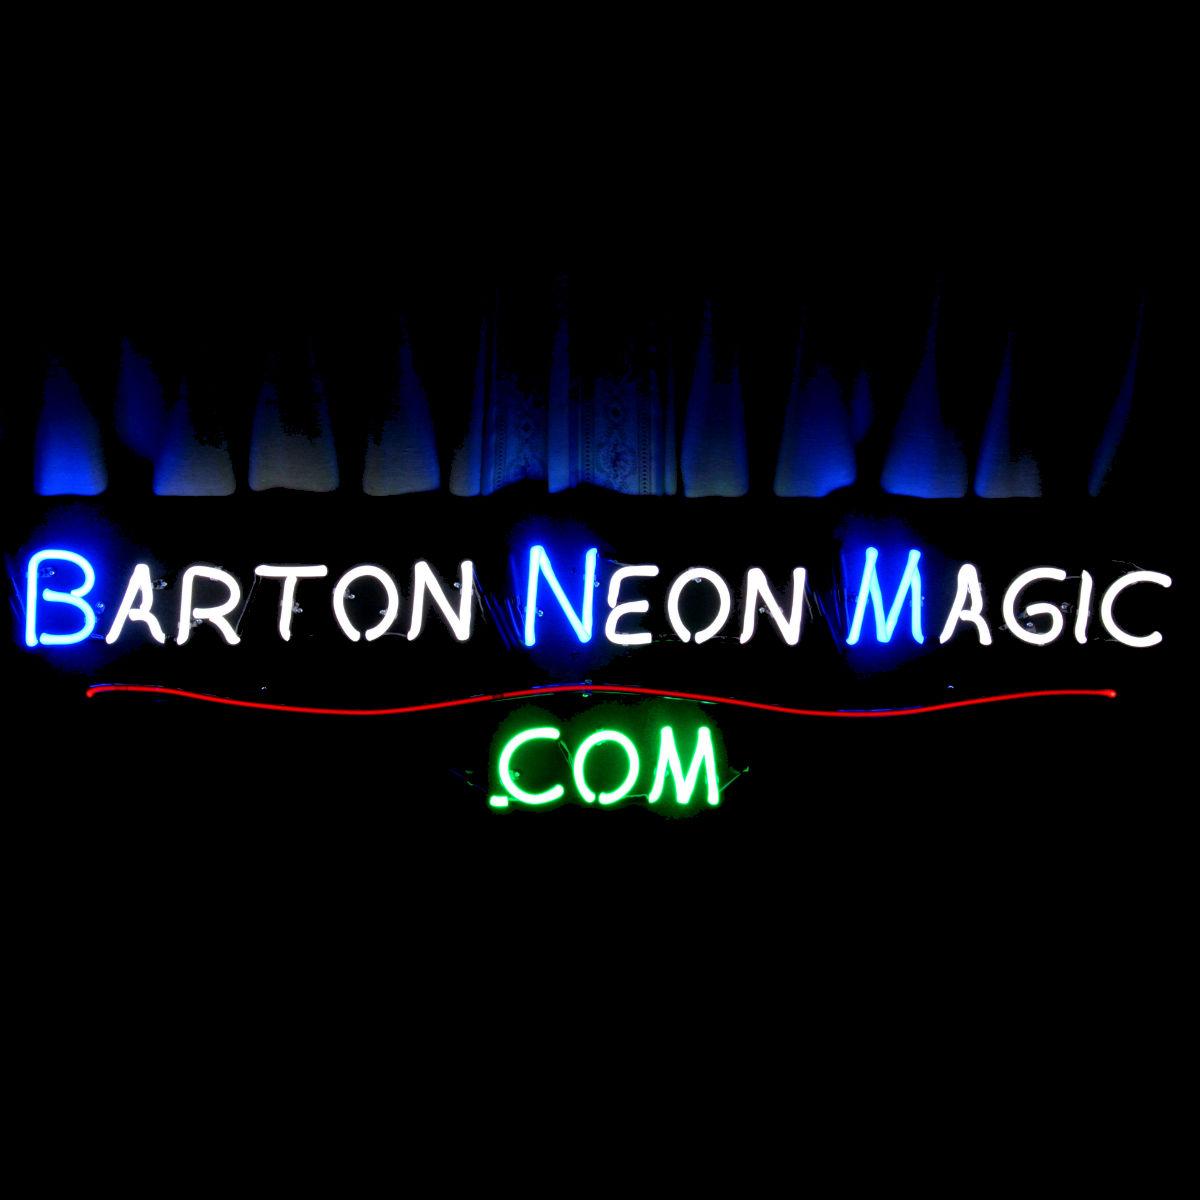 Custom hand-blown Neon Light Artworks by John Barton - BartonNeonMagic.com